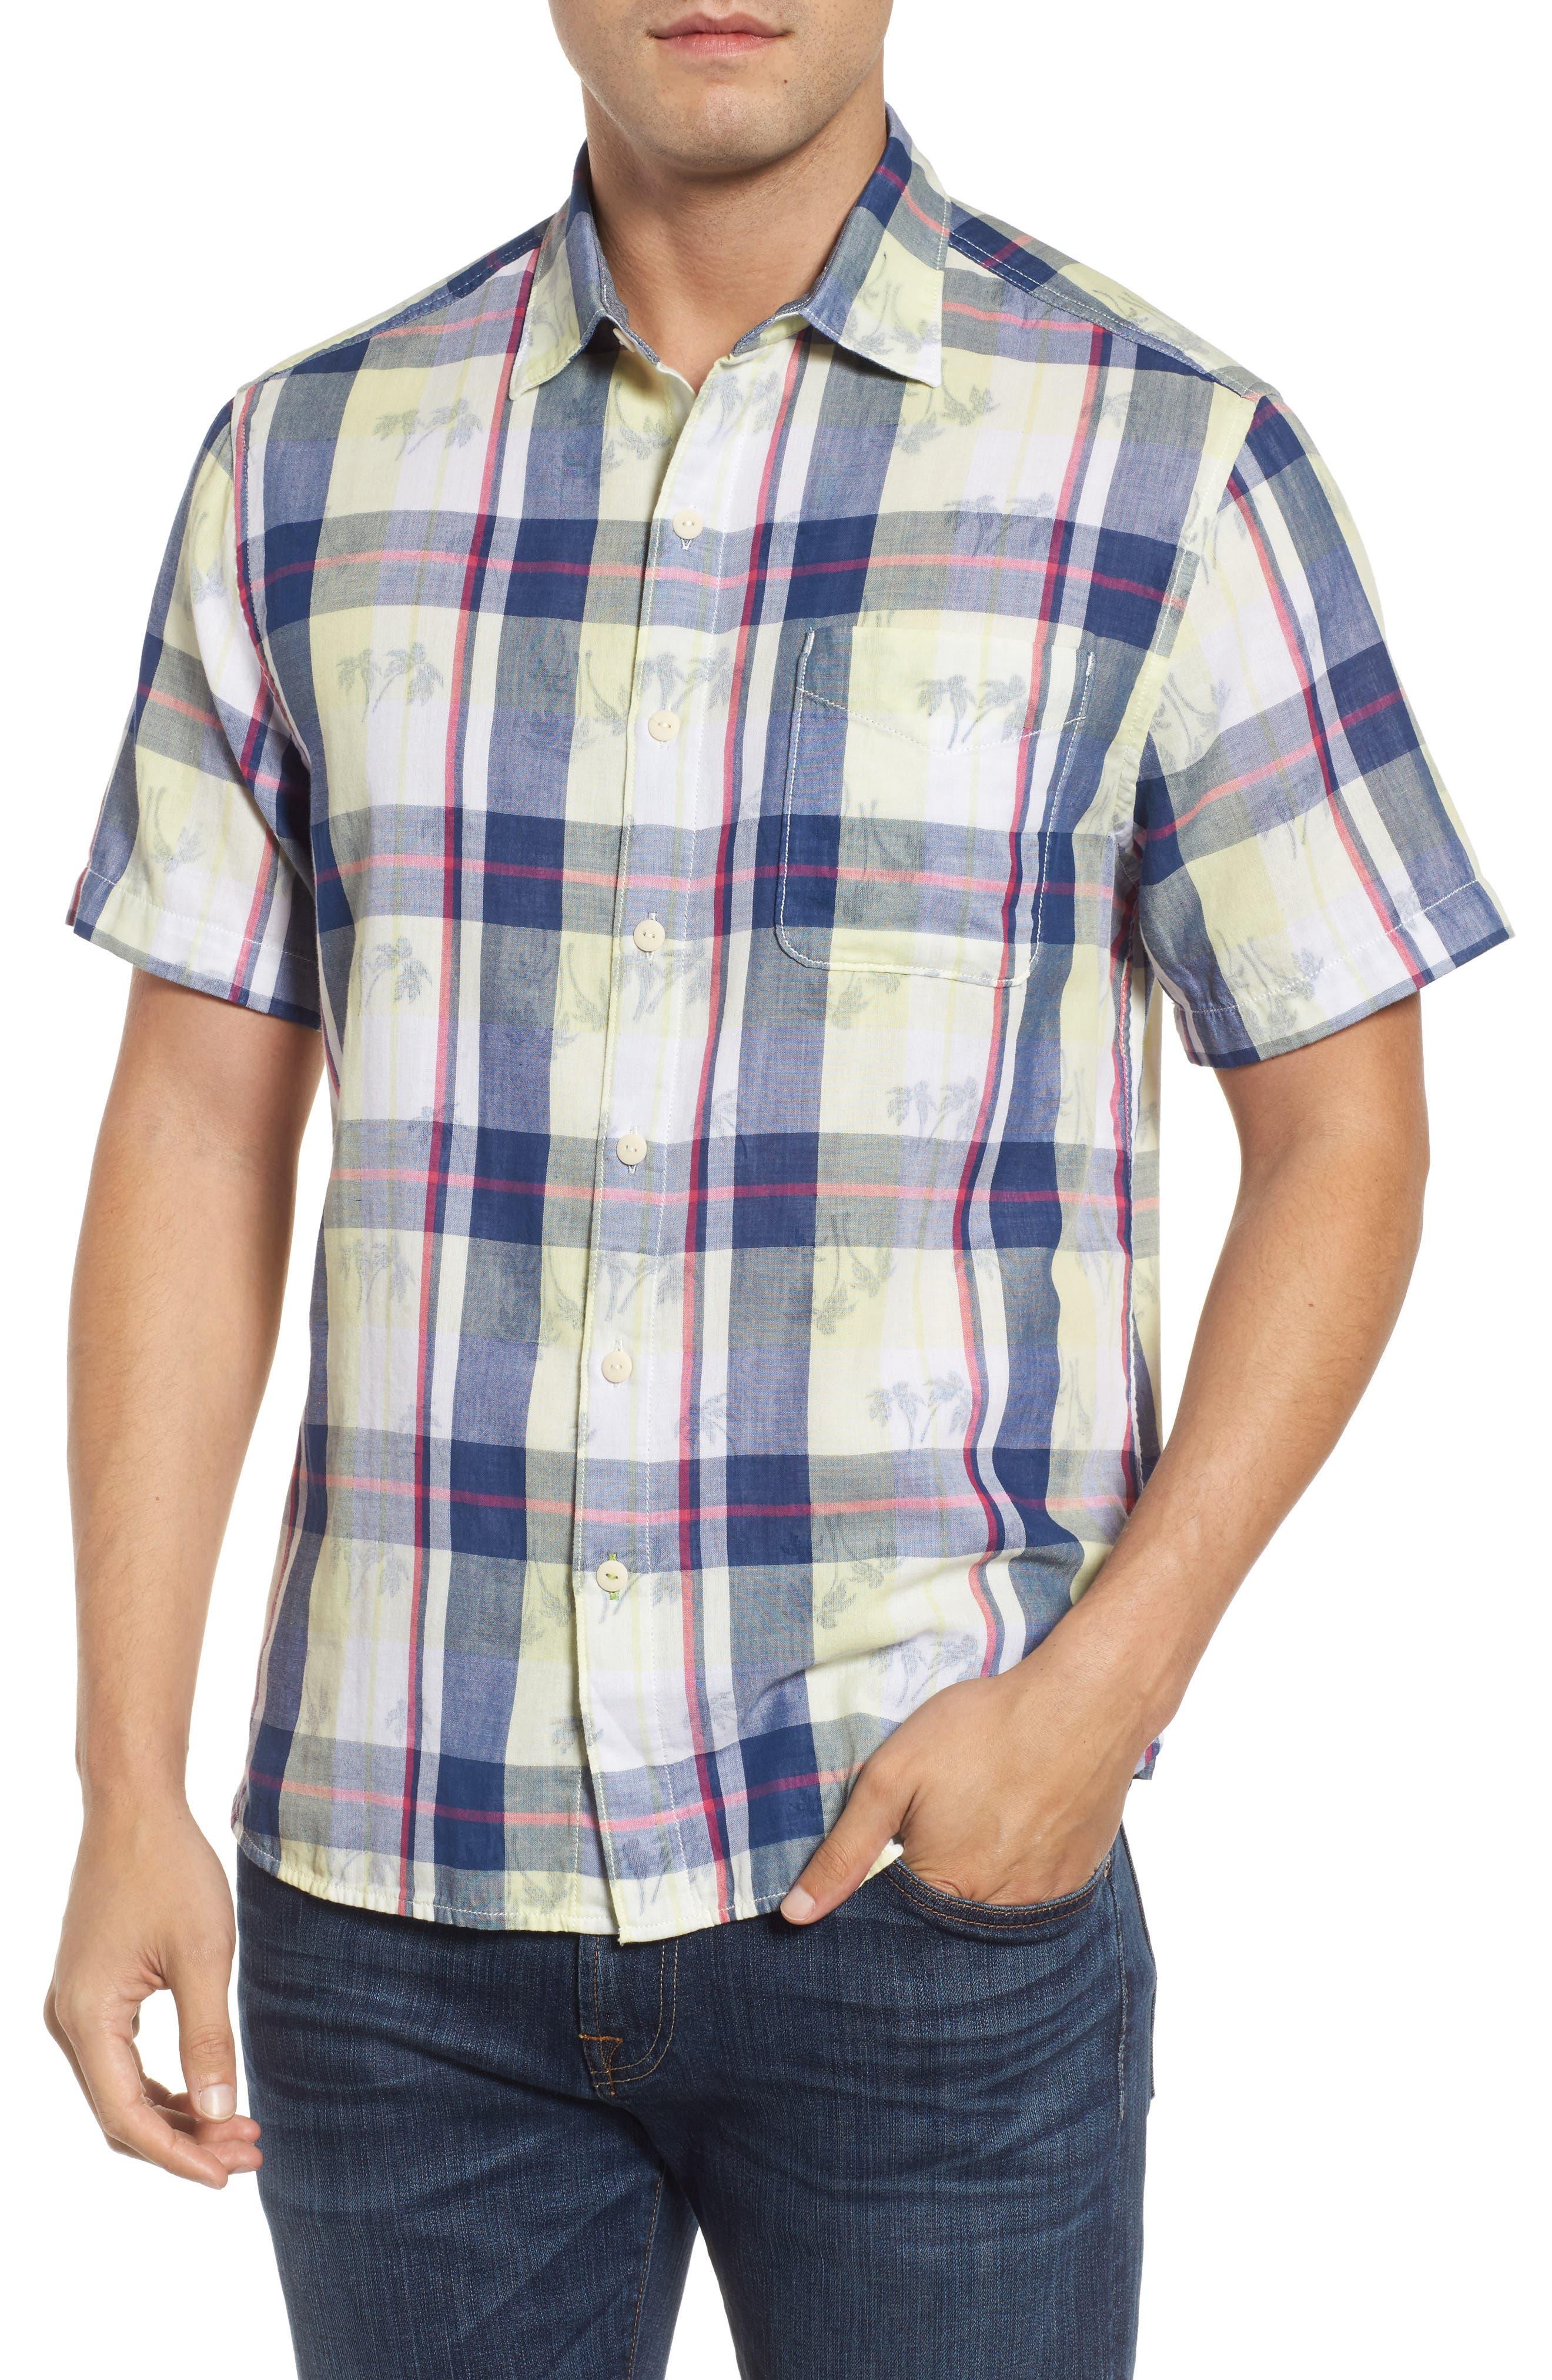 Alternate Image 1 Selected - Tommy Bahama Double Flora Plaid Sport Shirt